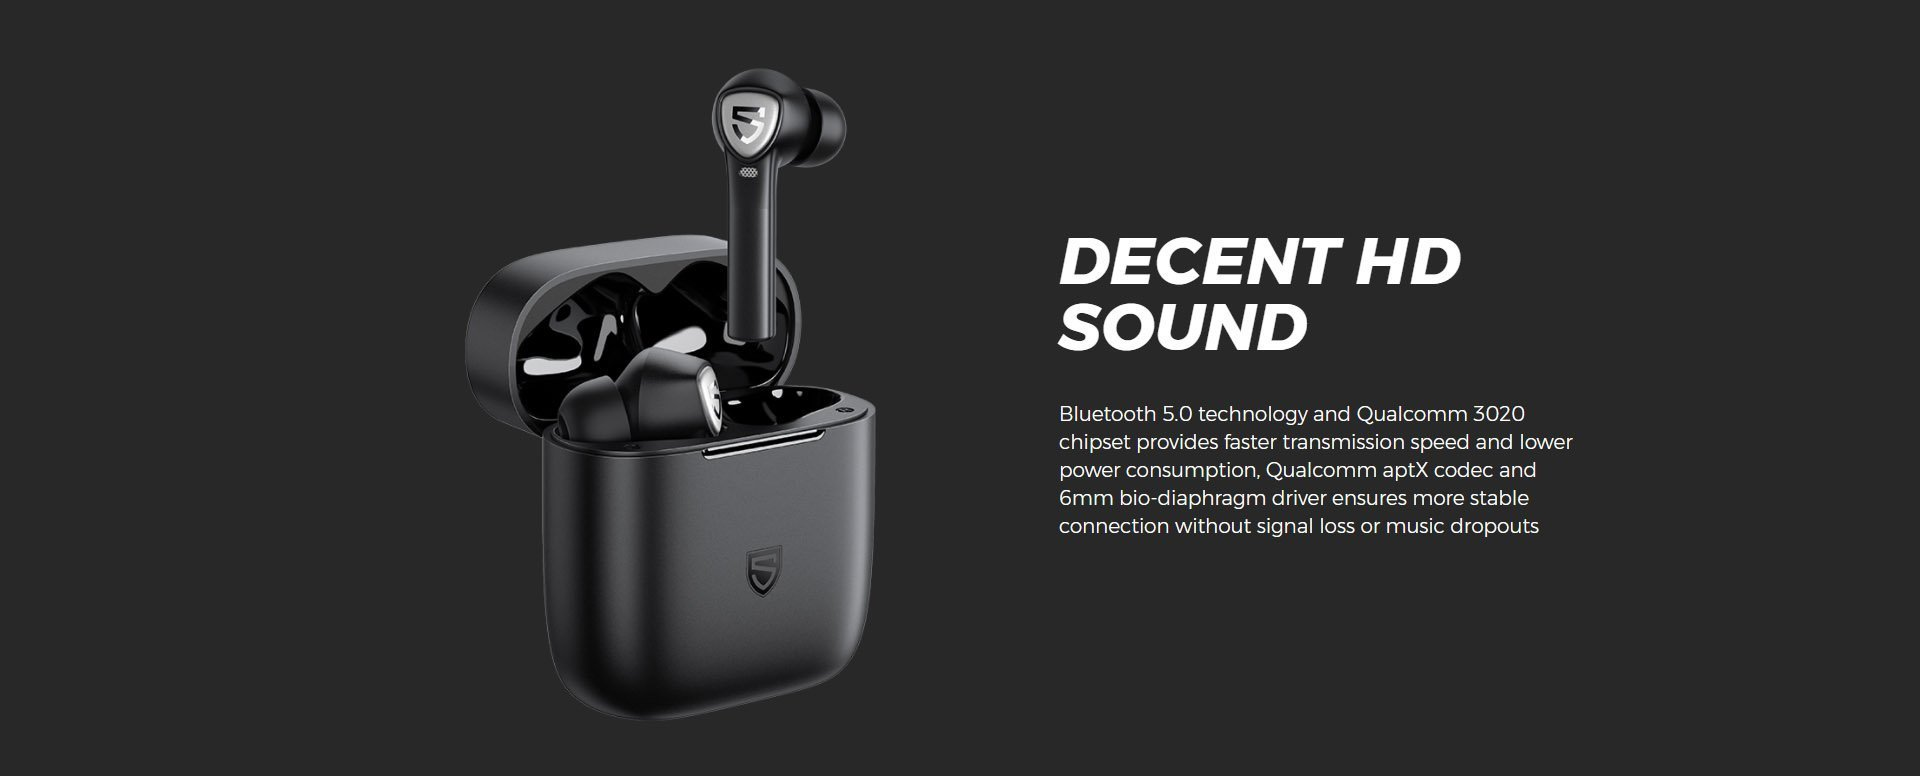 soundpeats true capsule 2 wireless earbuds